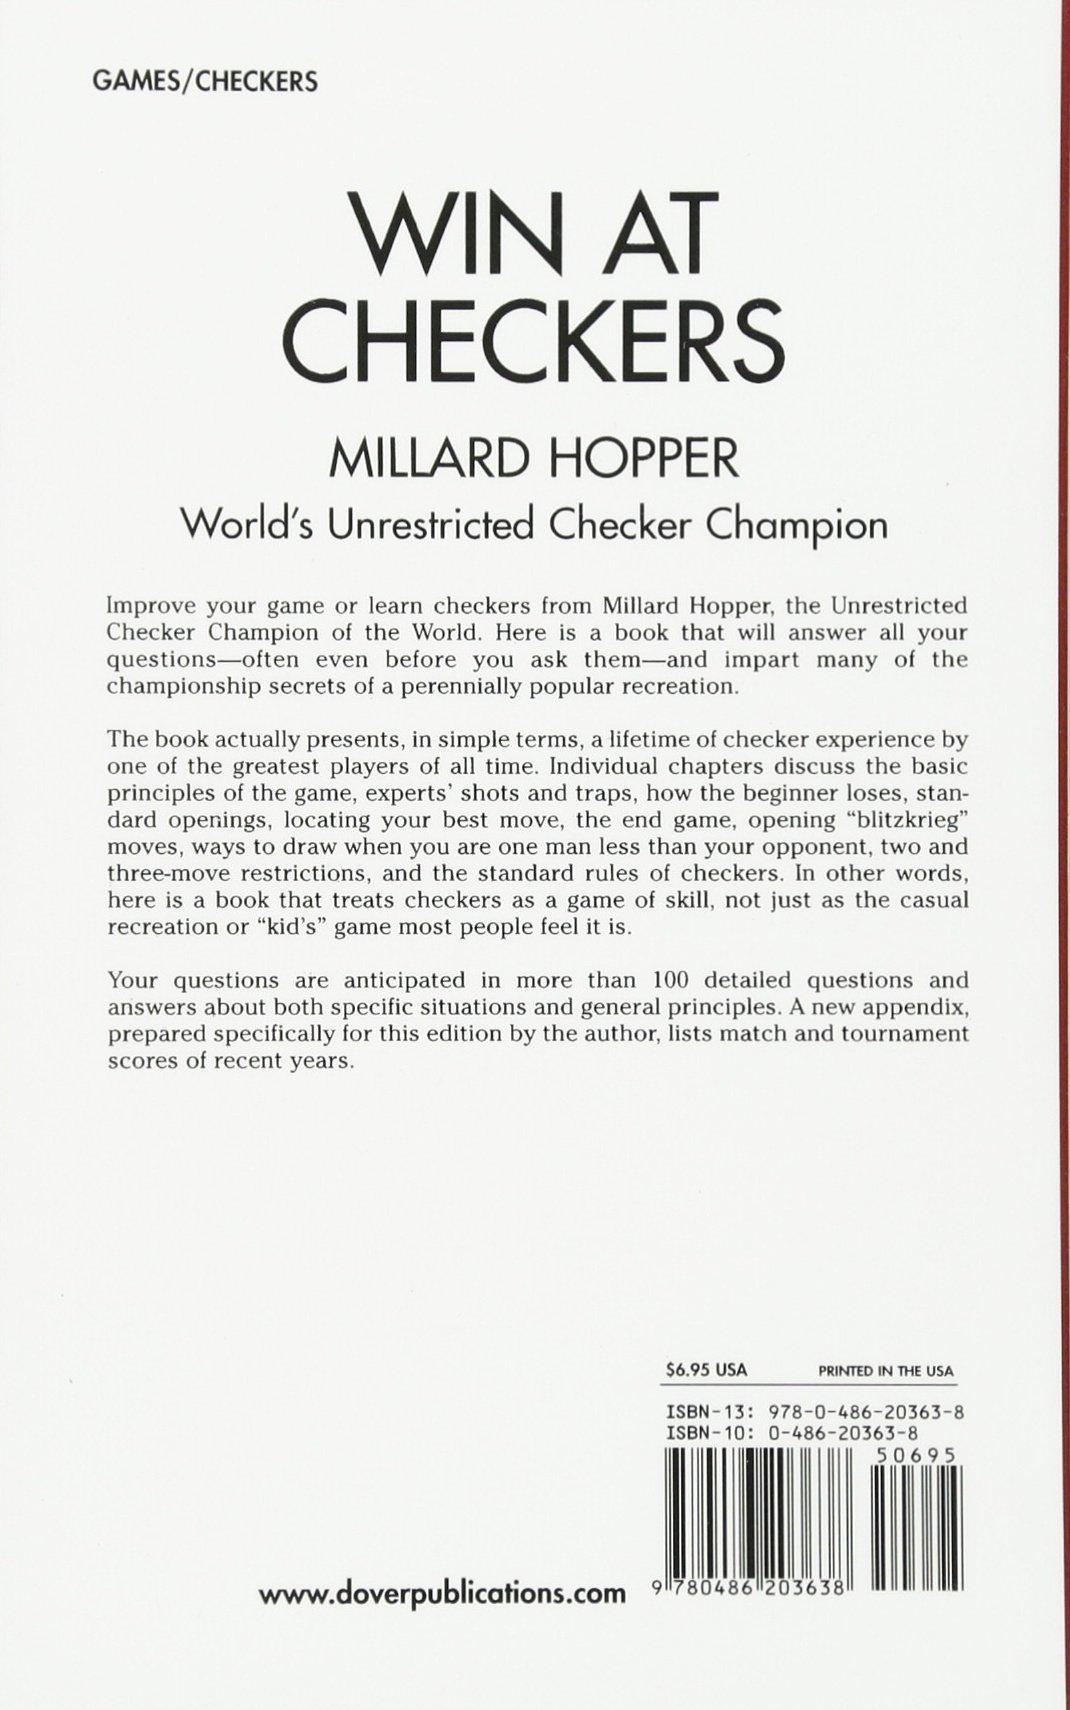 Win At Checkers Hopper Millard 9780486203638 Amazon Com Books,Moon Flowers Tattoo